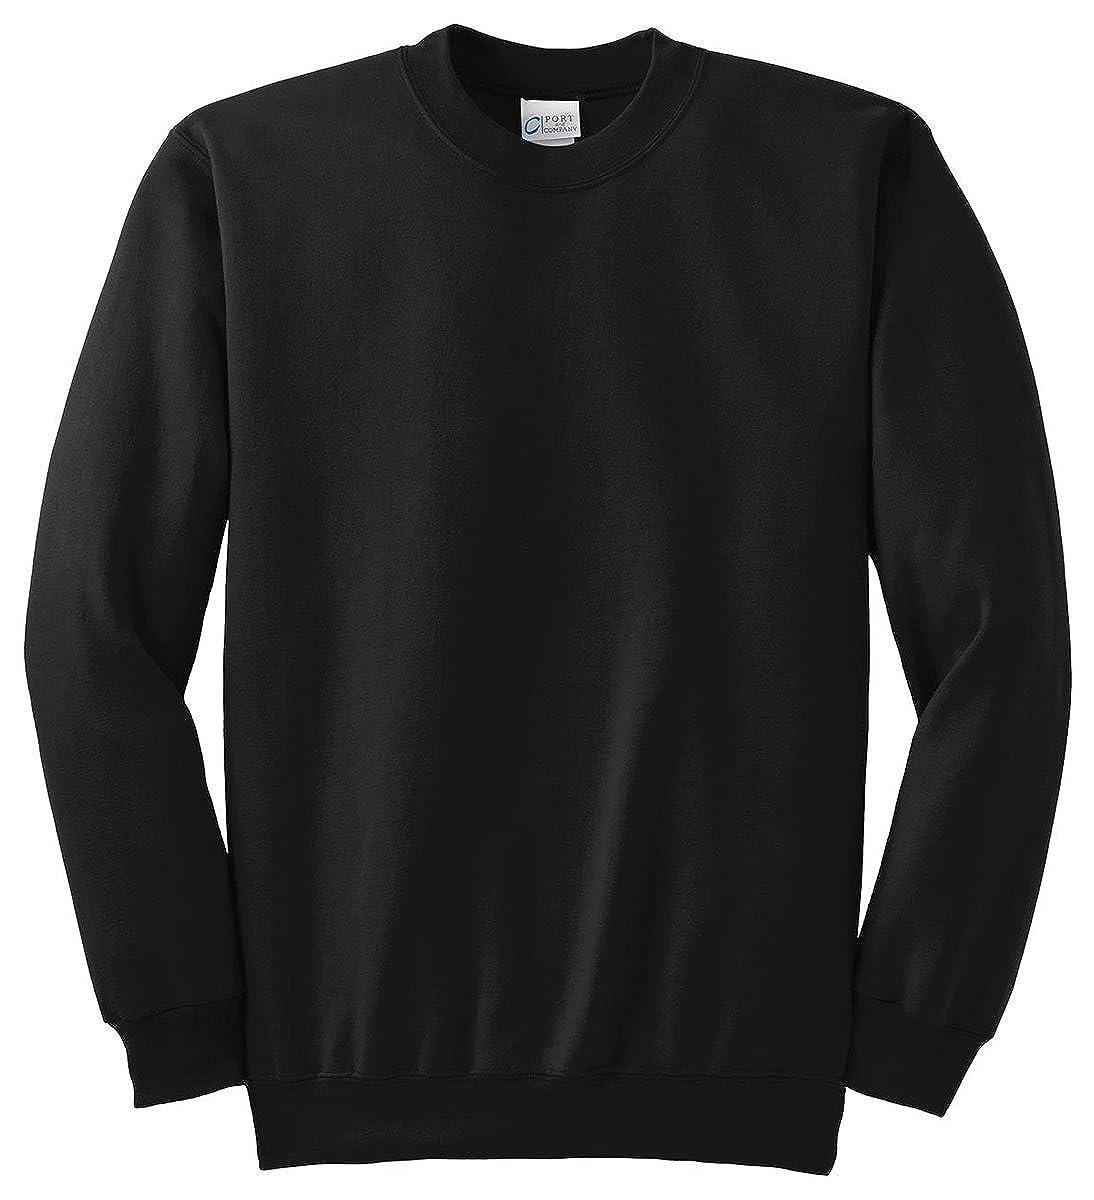 Port /& Company Mens Knit Collar Crewneck Sweatshirt/_Jet Black/_XXXX-Large